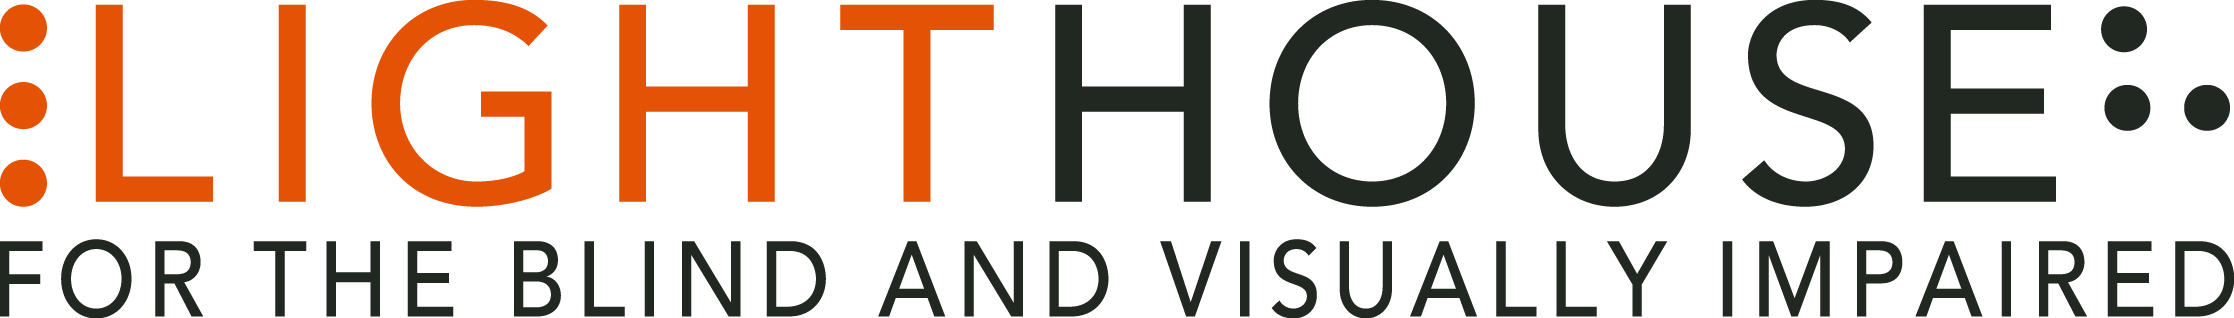 LightHouse Employment Immersion Program